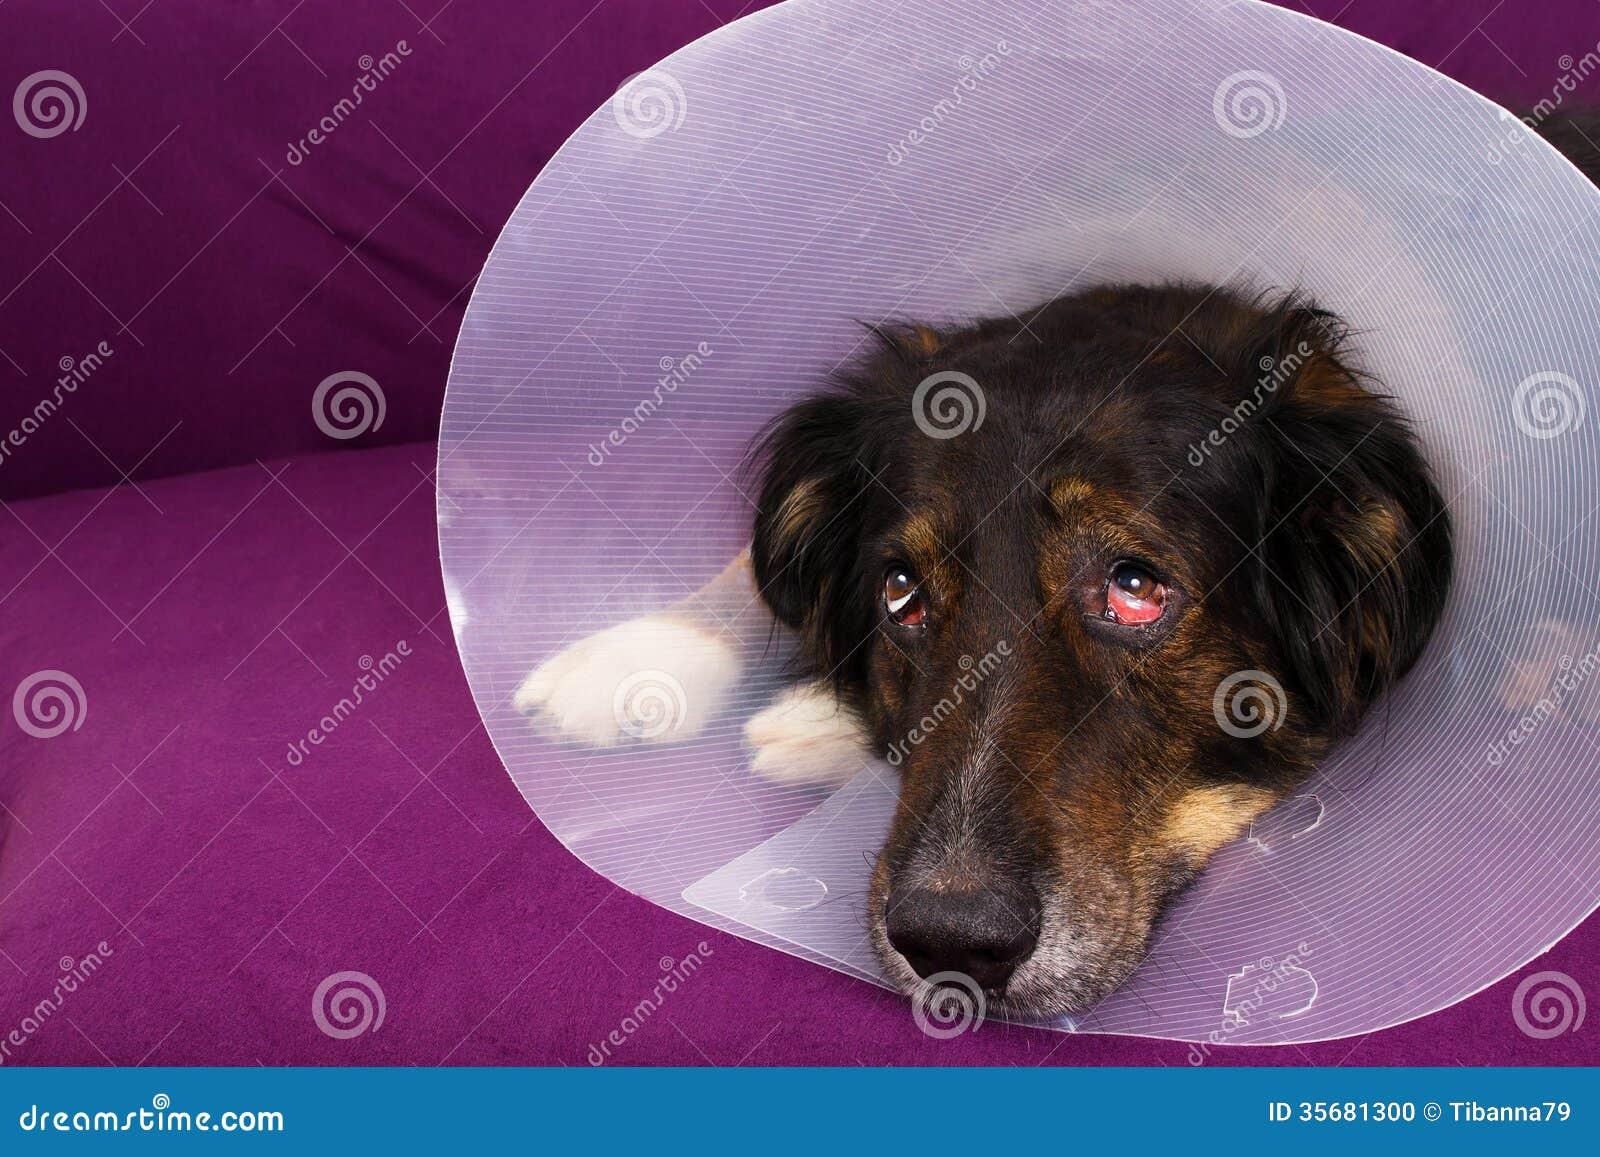 Suffering Dog Stock Photo Image 35681300